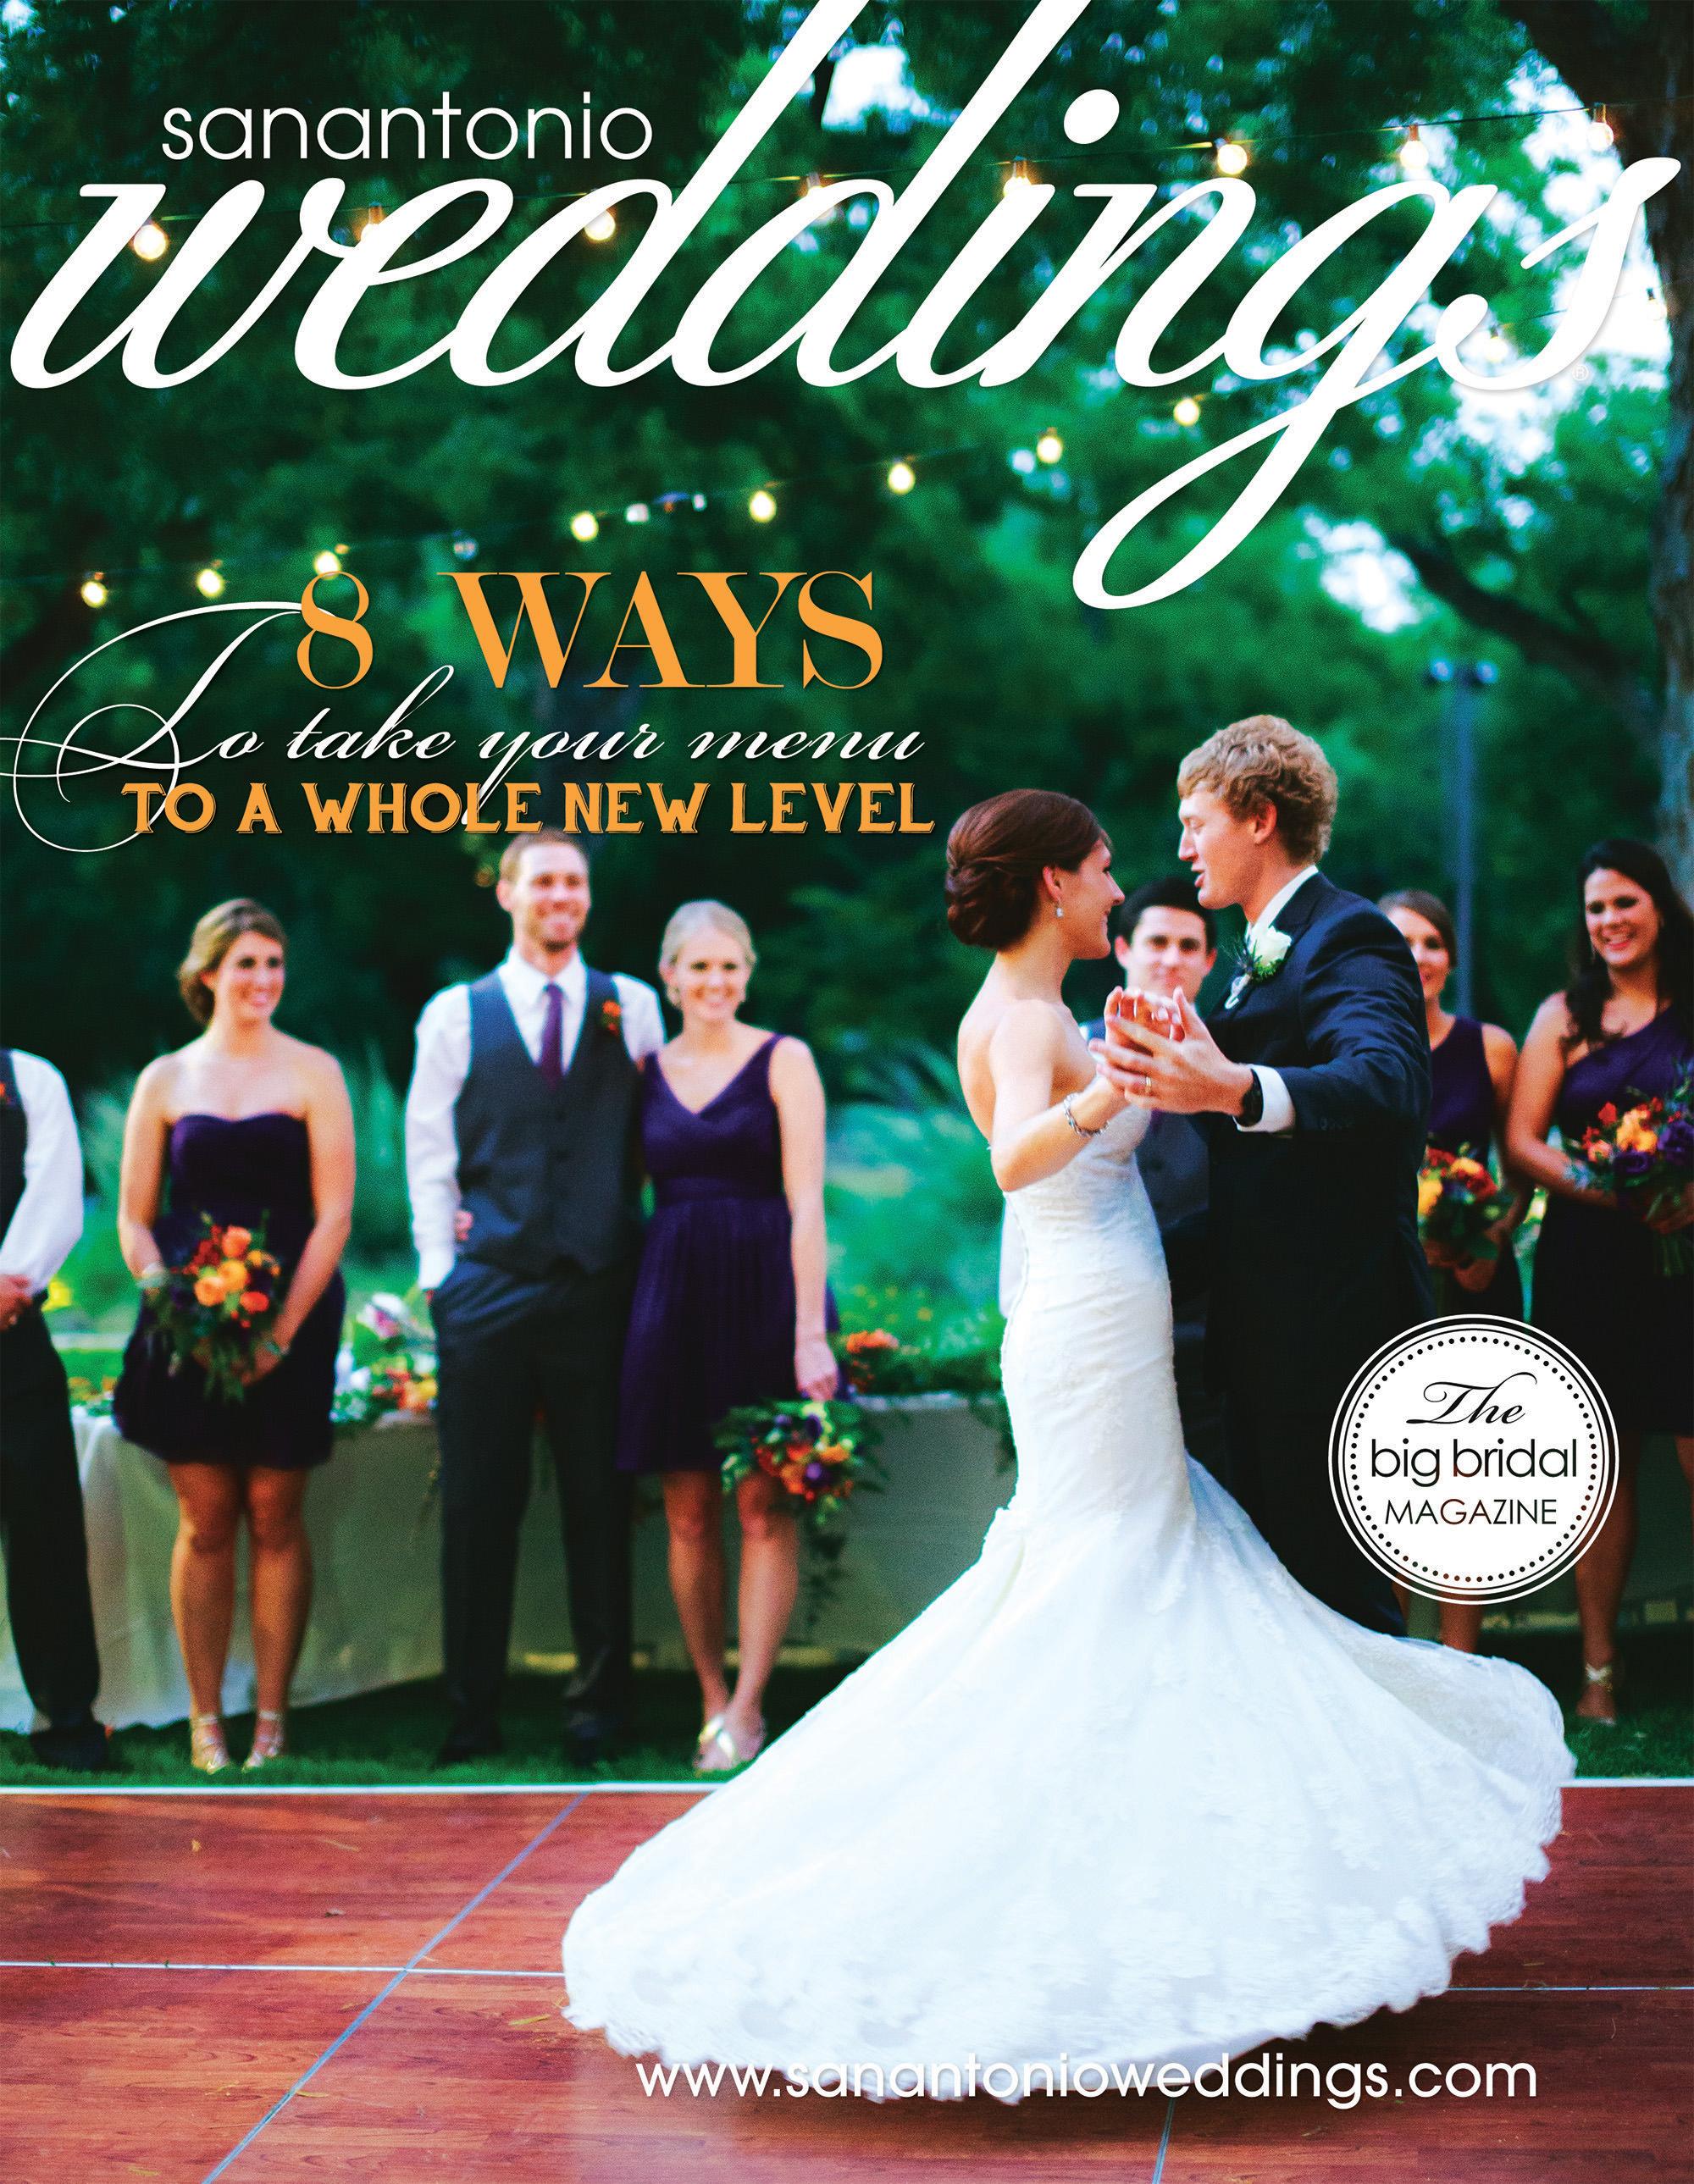 San Antonio Weddings Magazine Cover  (2015, Pamela & Taylor Dreiss)